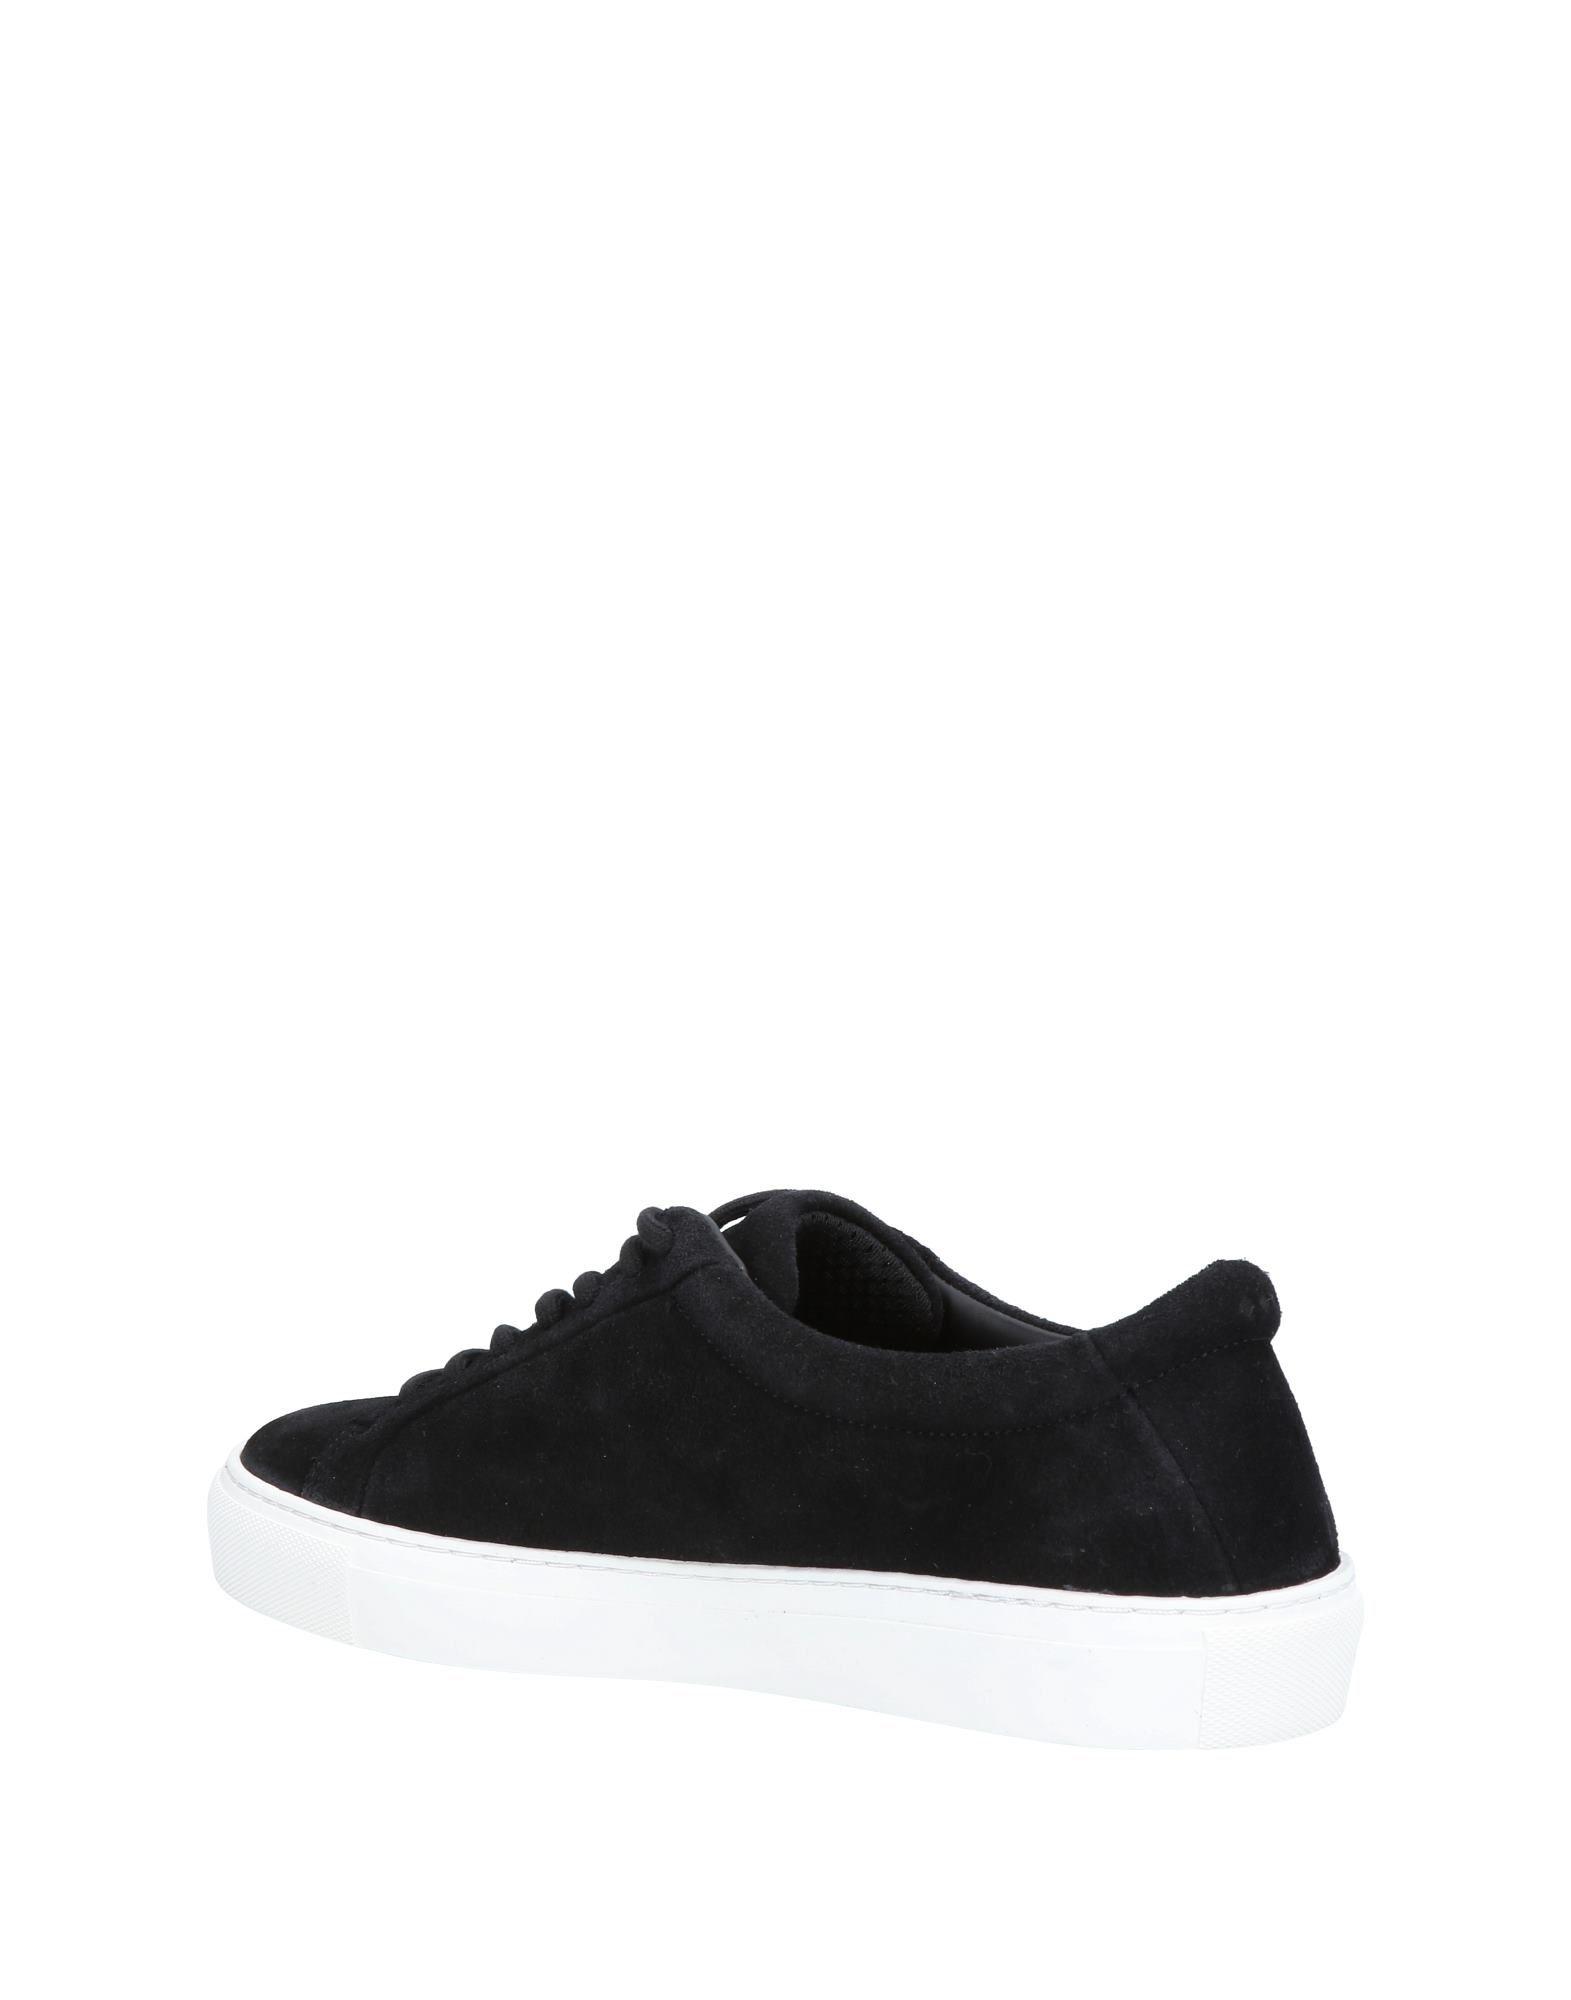 Royal Republiq Sneakers Herren  11460947XU Neue Schuhe